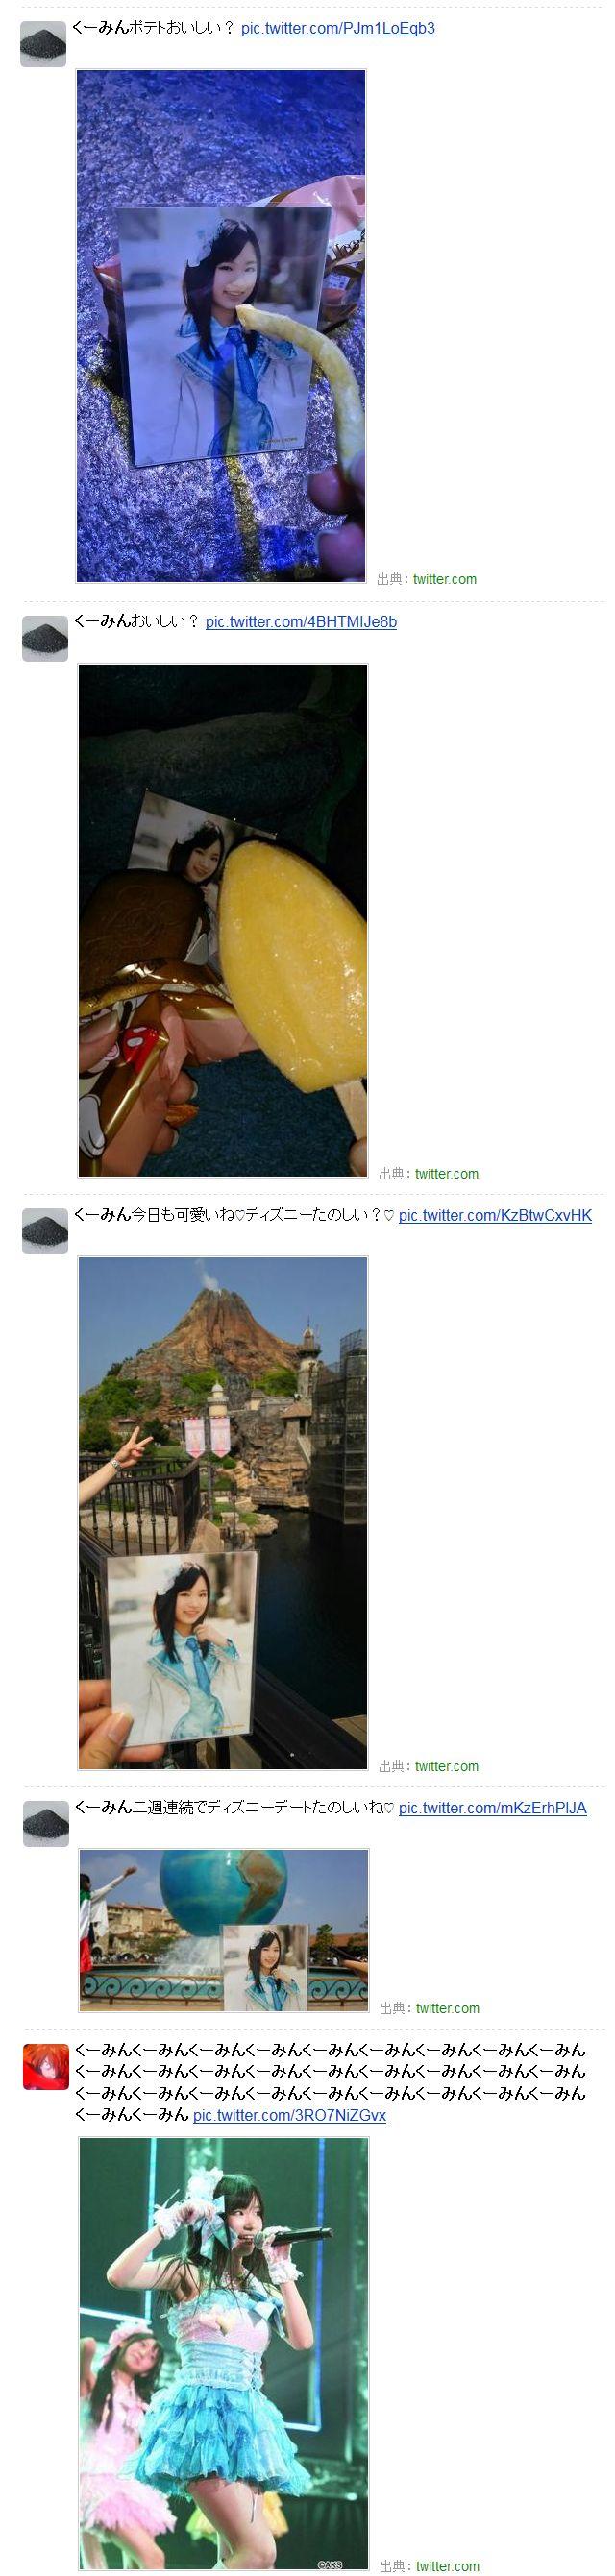 YagamiKuminPotato20150507